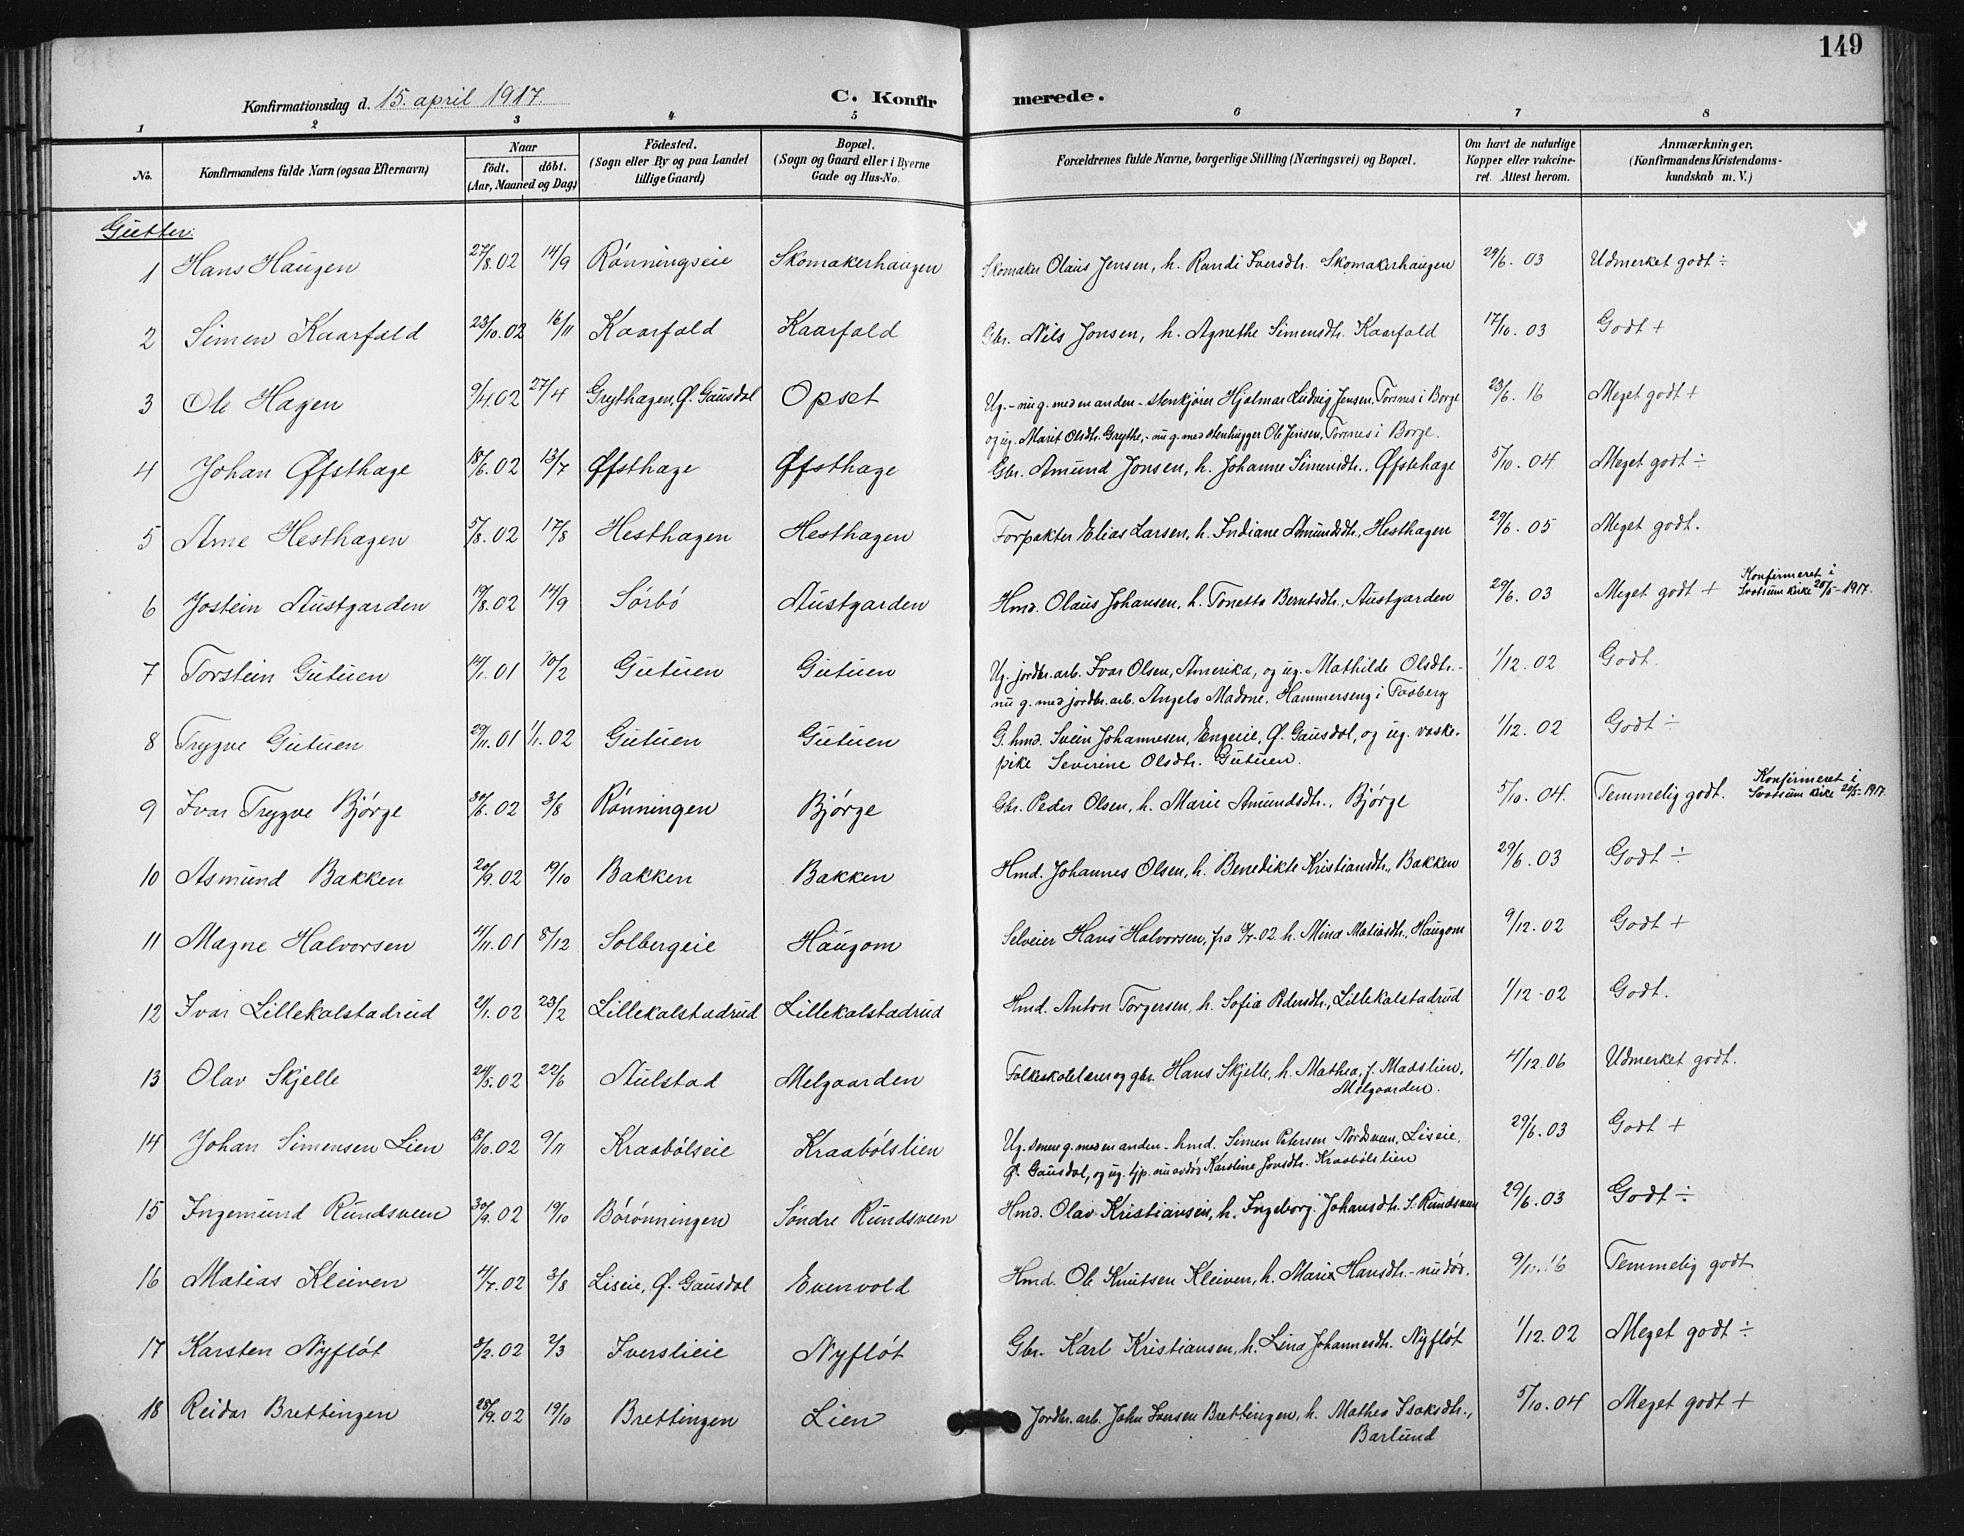 SAH, Vestre Gausdal prestekontor, Klokkerbok nr. 3, 1896-1925, s. 149